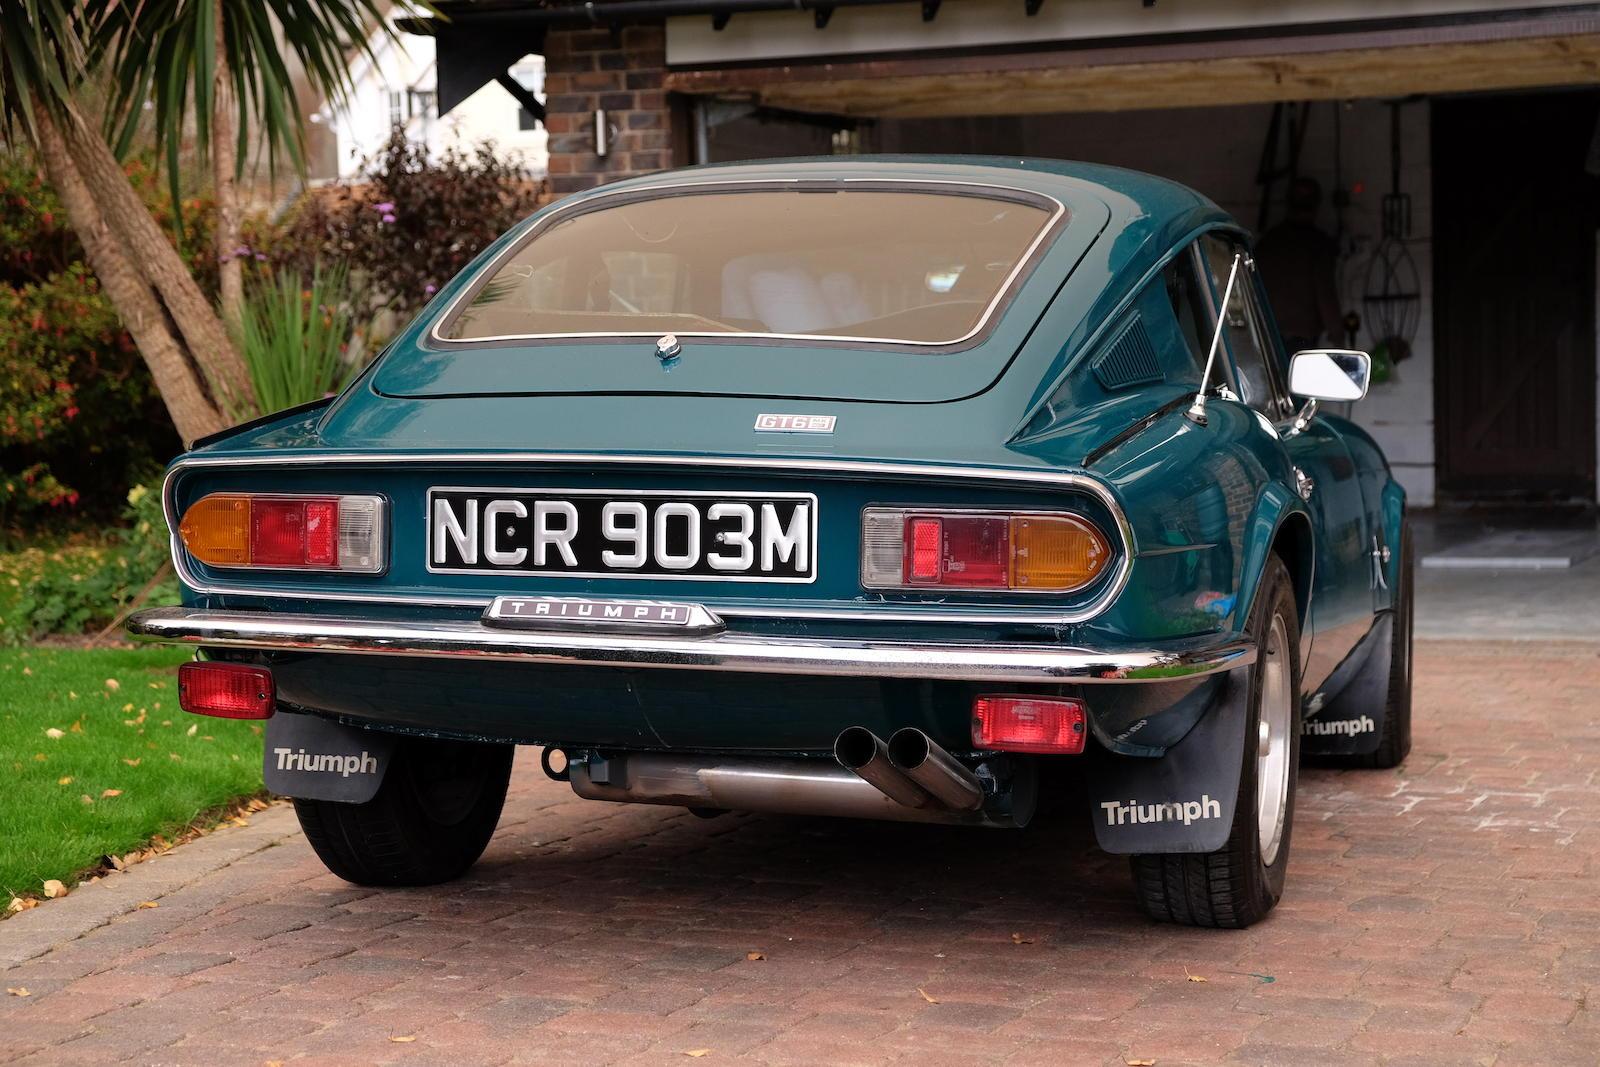 1972 Triumph GT6 Mk III Coupé rear